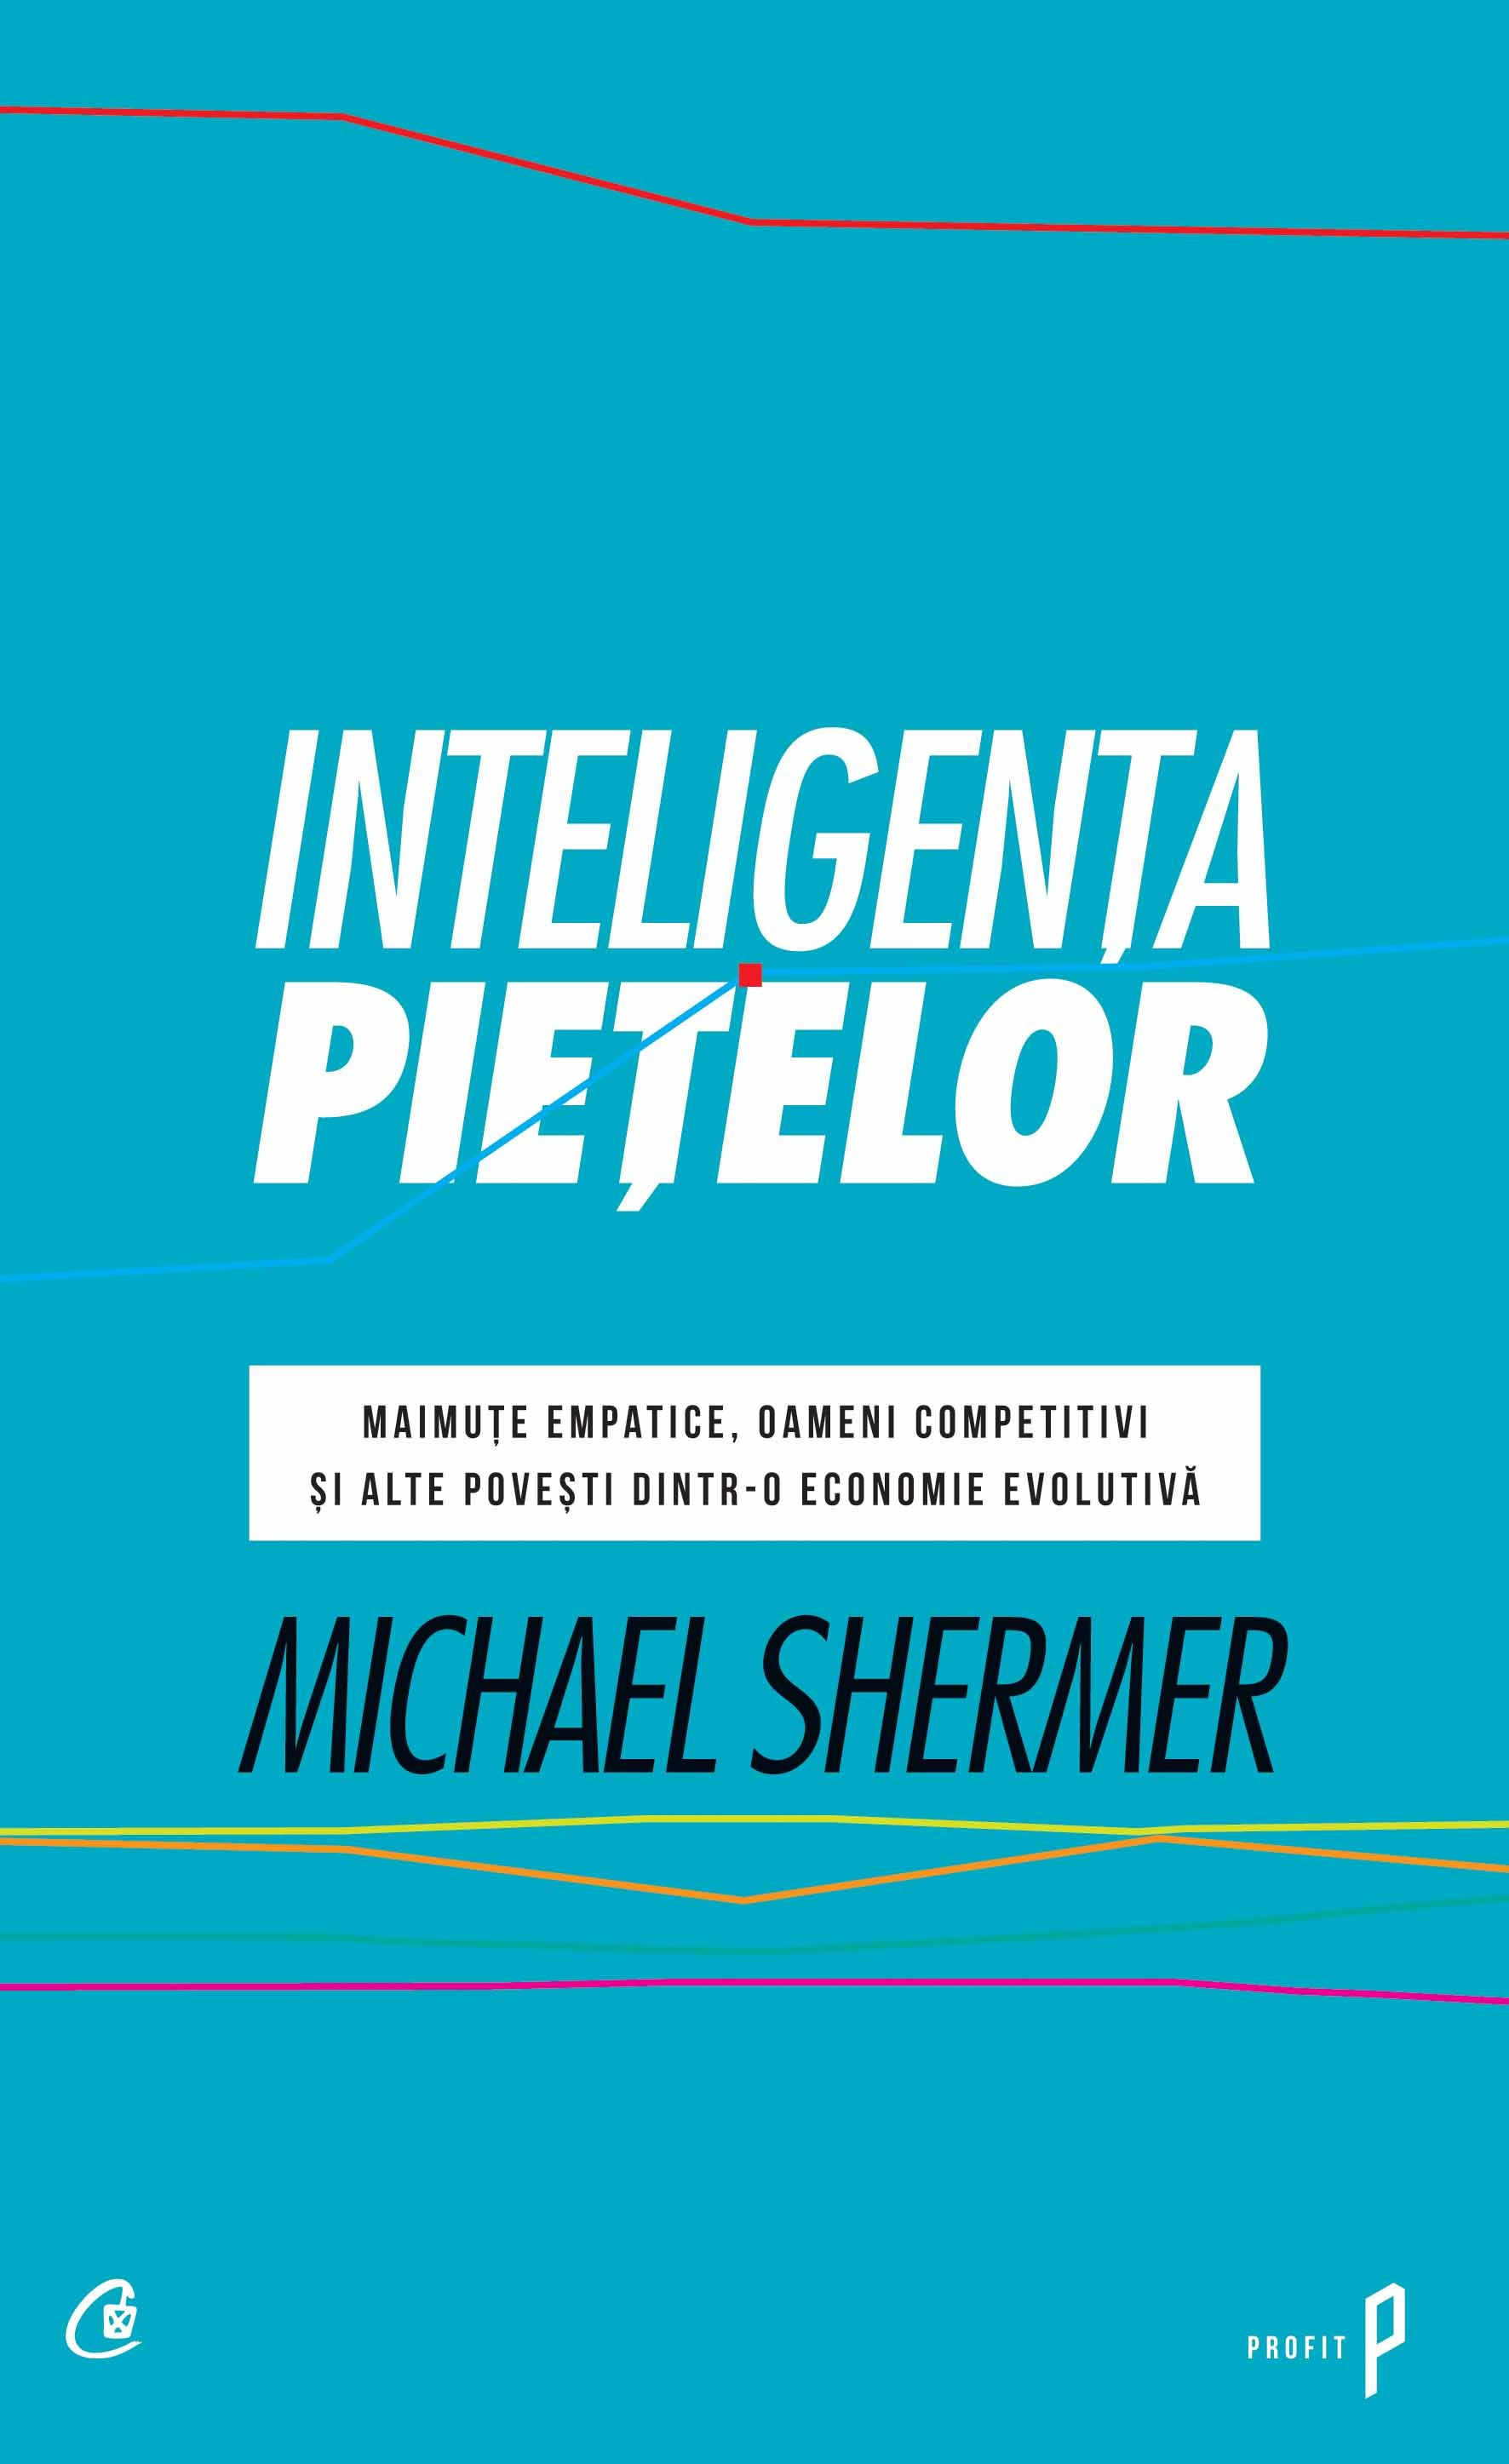 Inteligenţa pieţelor - Michael Shermer